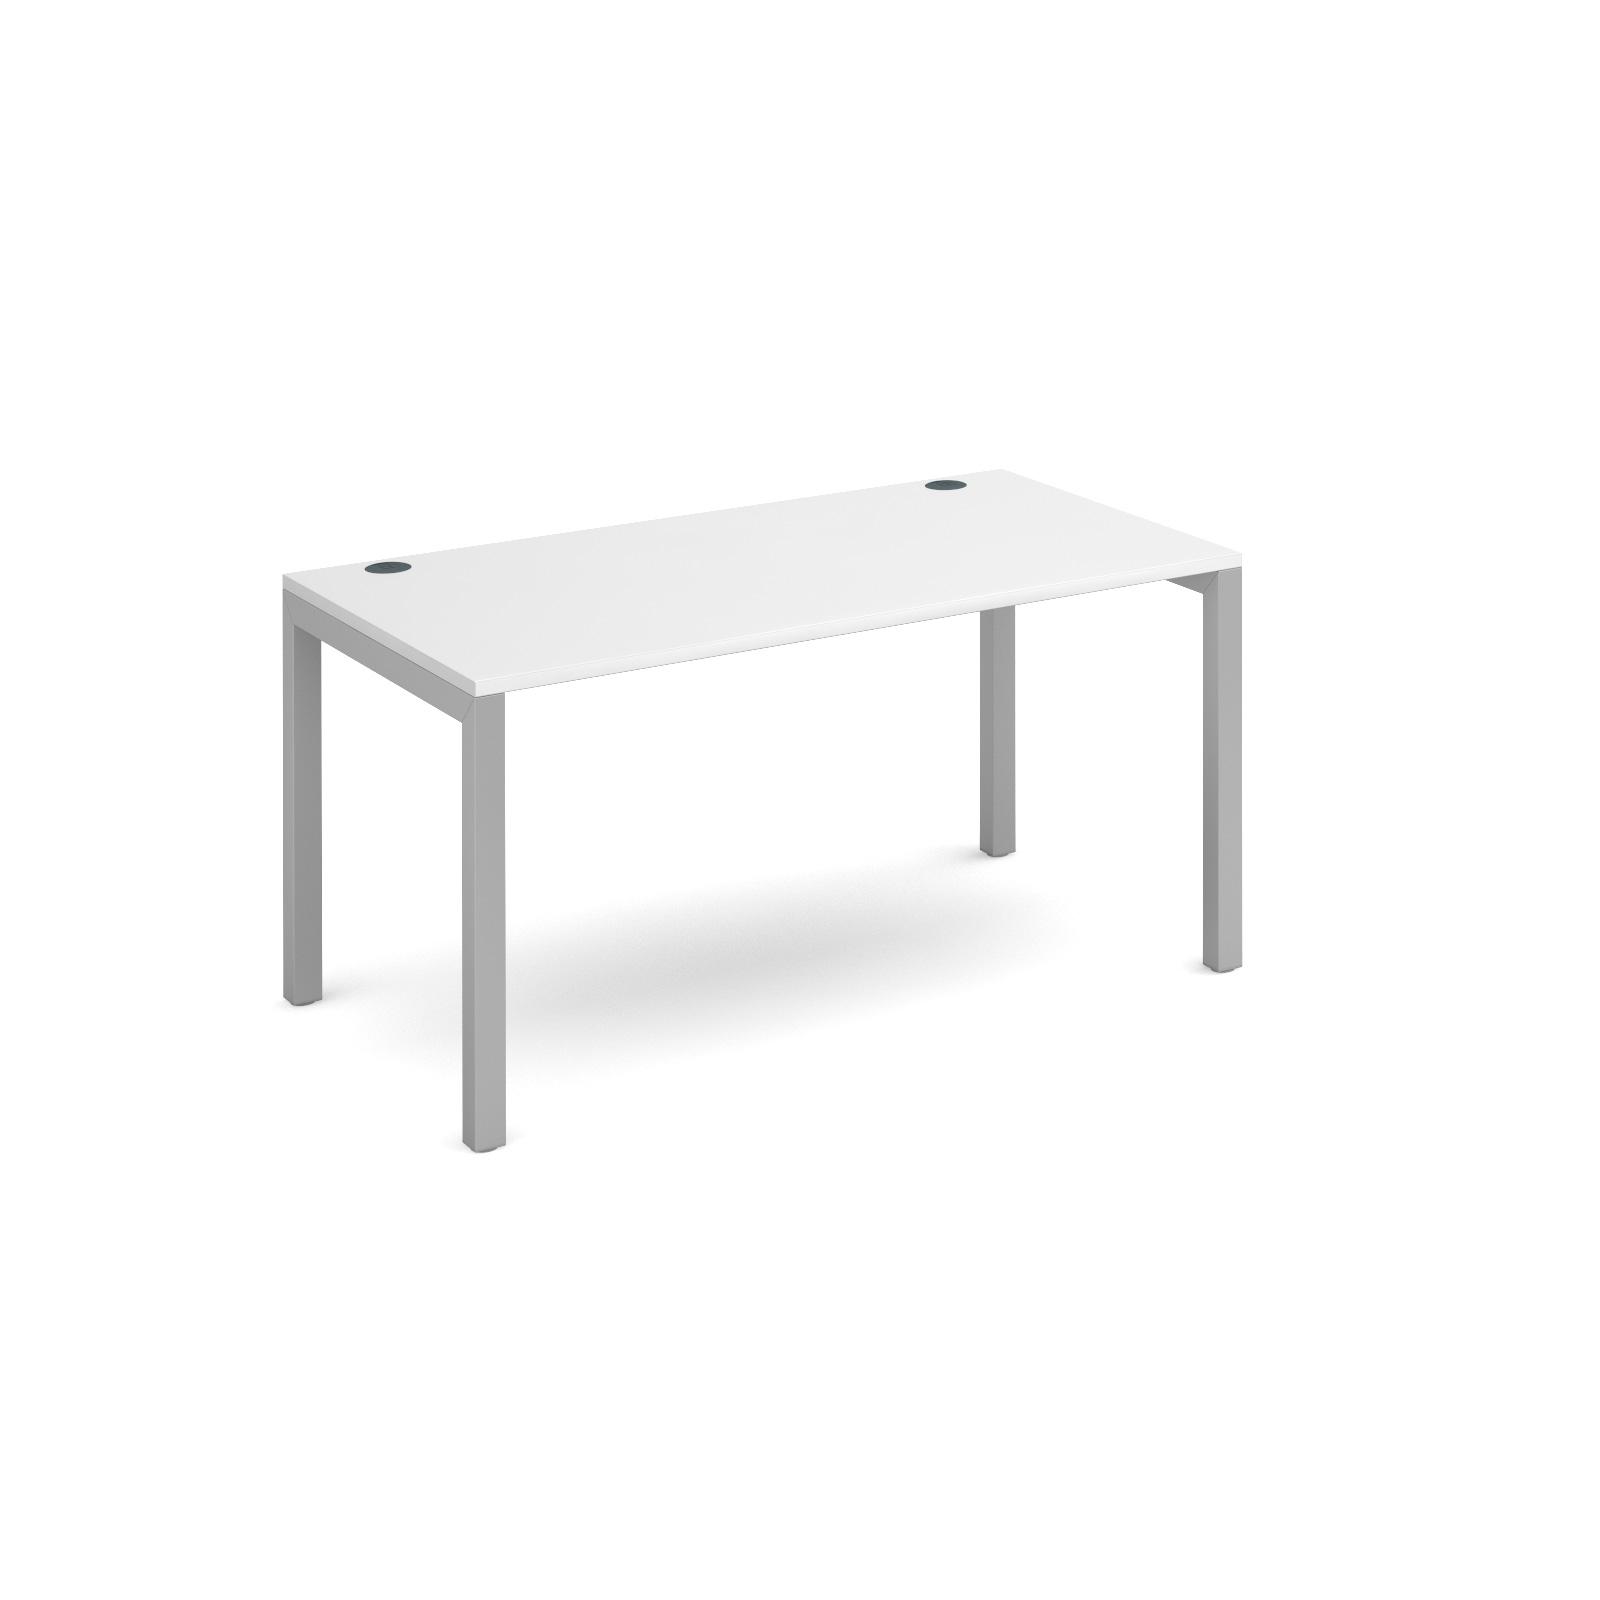 Connex Single Desk 1400mm x 800mm - Silver Frame, White Top